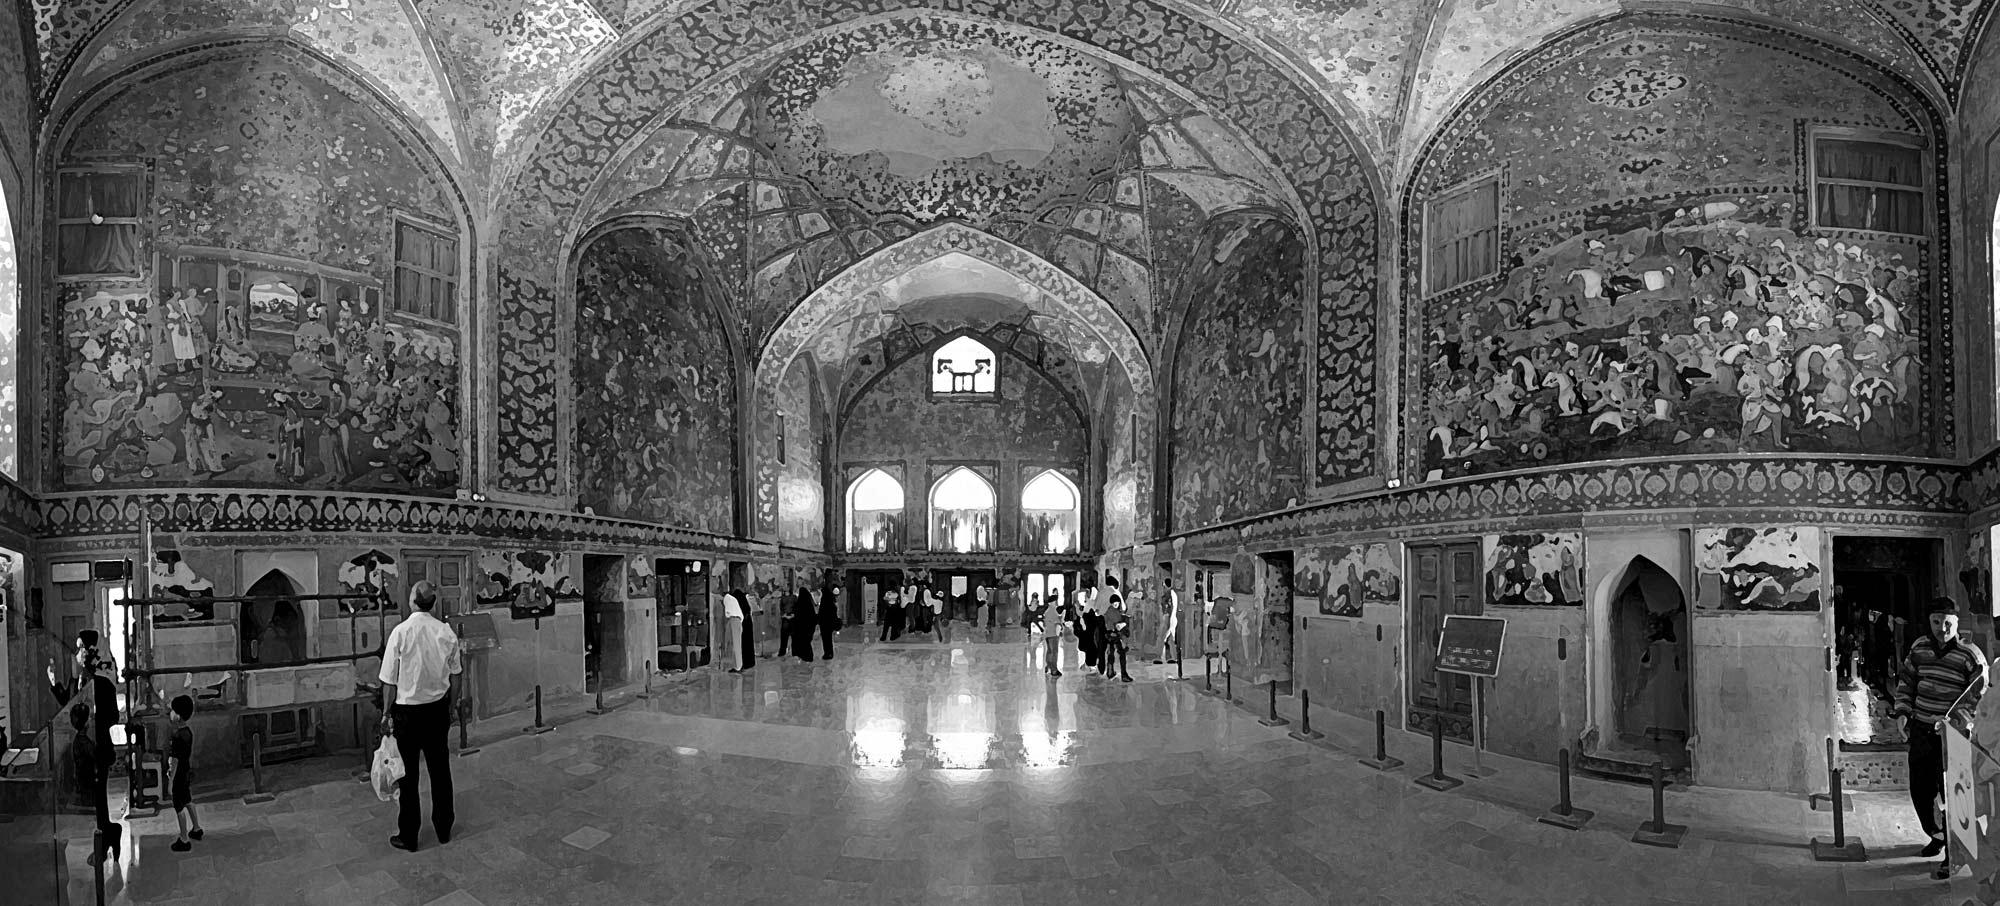 چهل ستون اصفهان